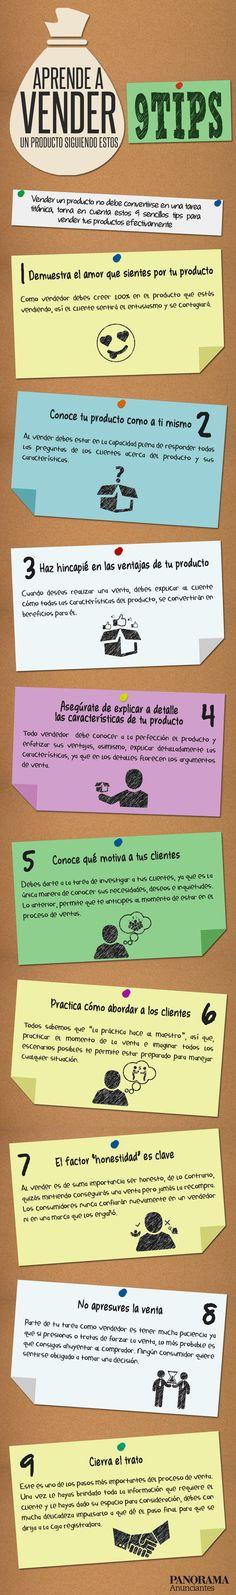 9 consejos para vender un producto #infografia #infographic #marketing